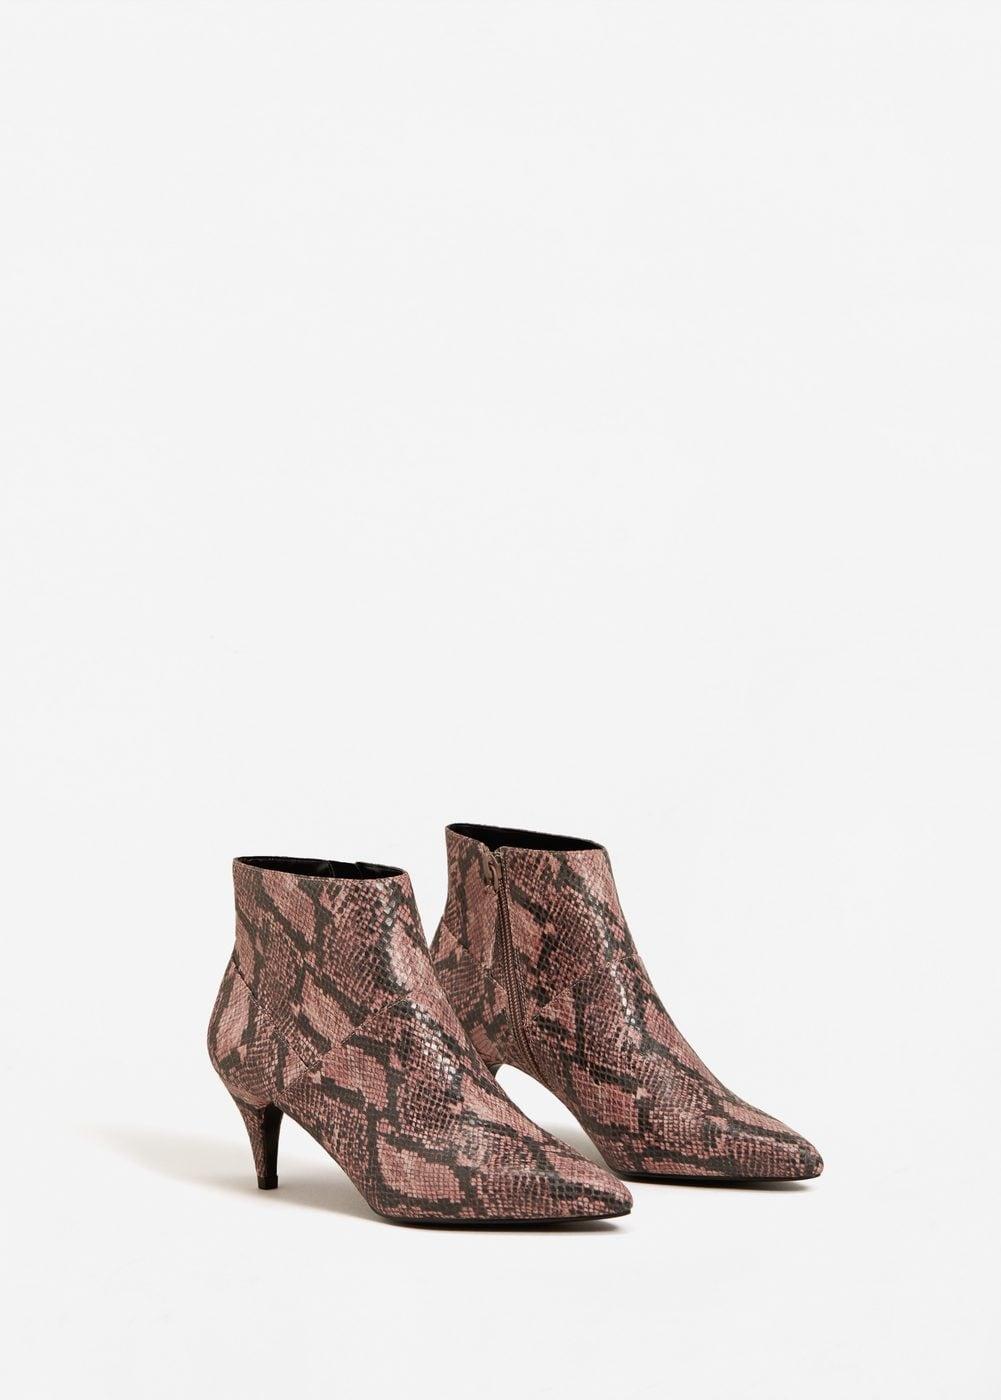 34b962f62d7 Kitten Heel Boots Trend Fall 2017 - Zara Topshop Tibi